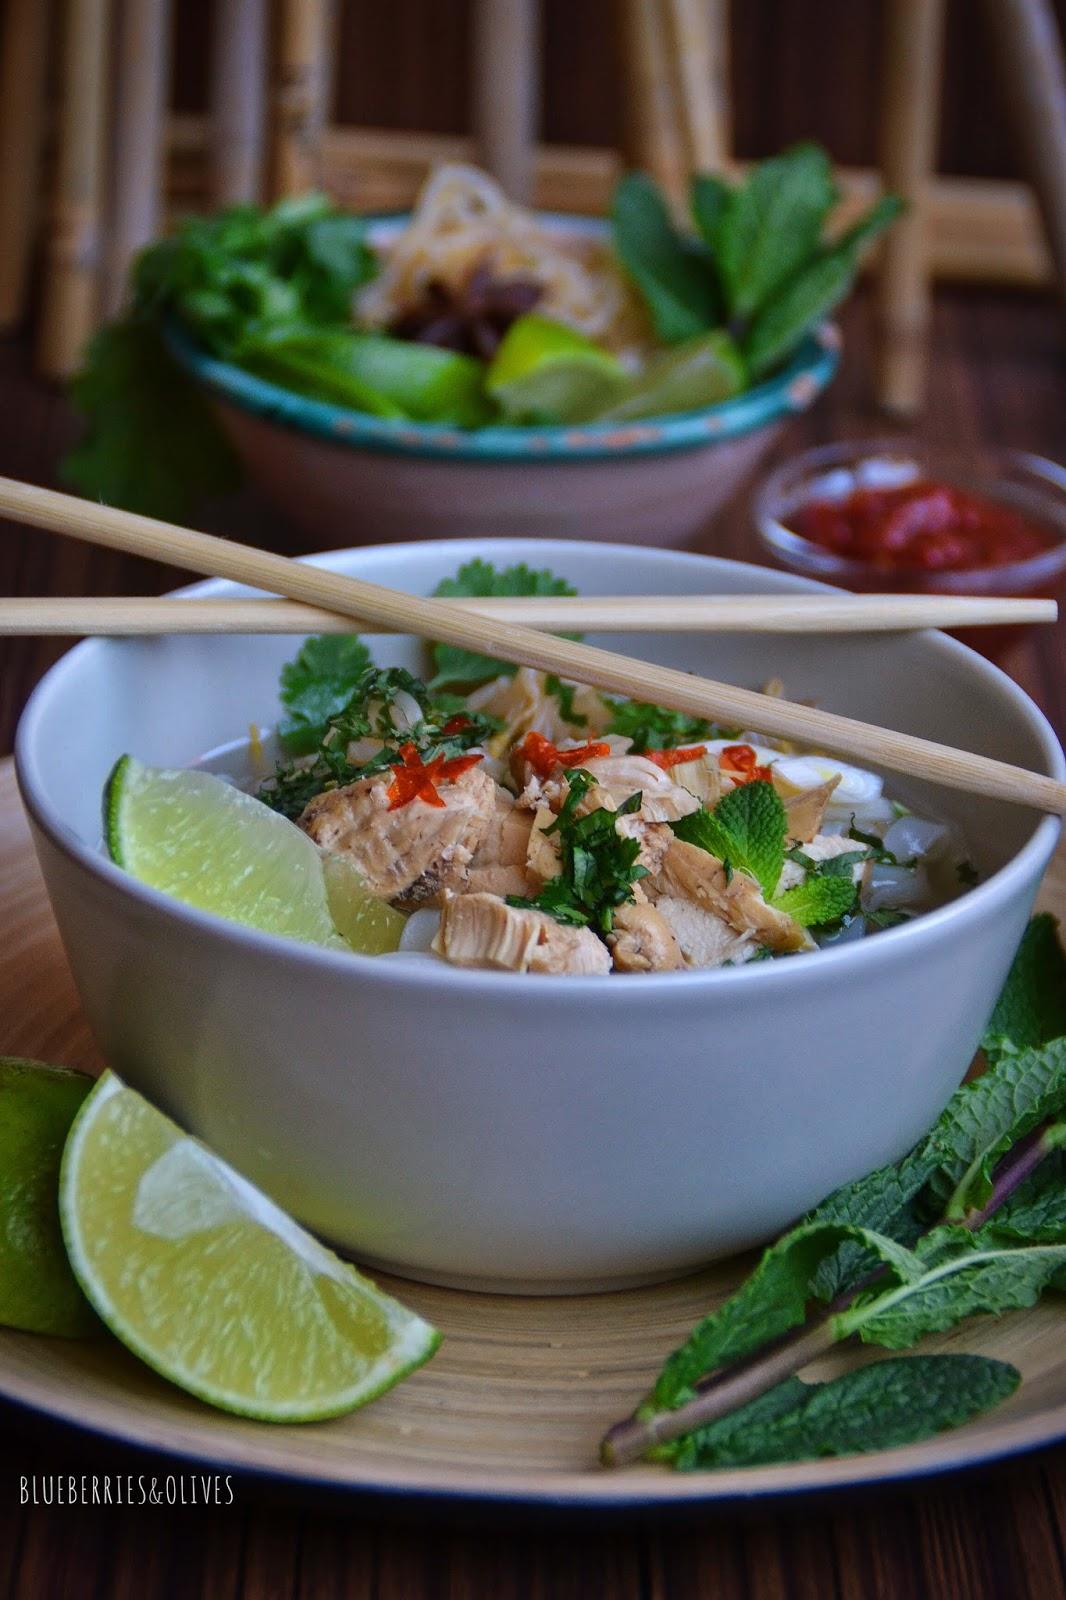 PHỞ GÀ: Vietnamese chicken noodle soop